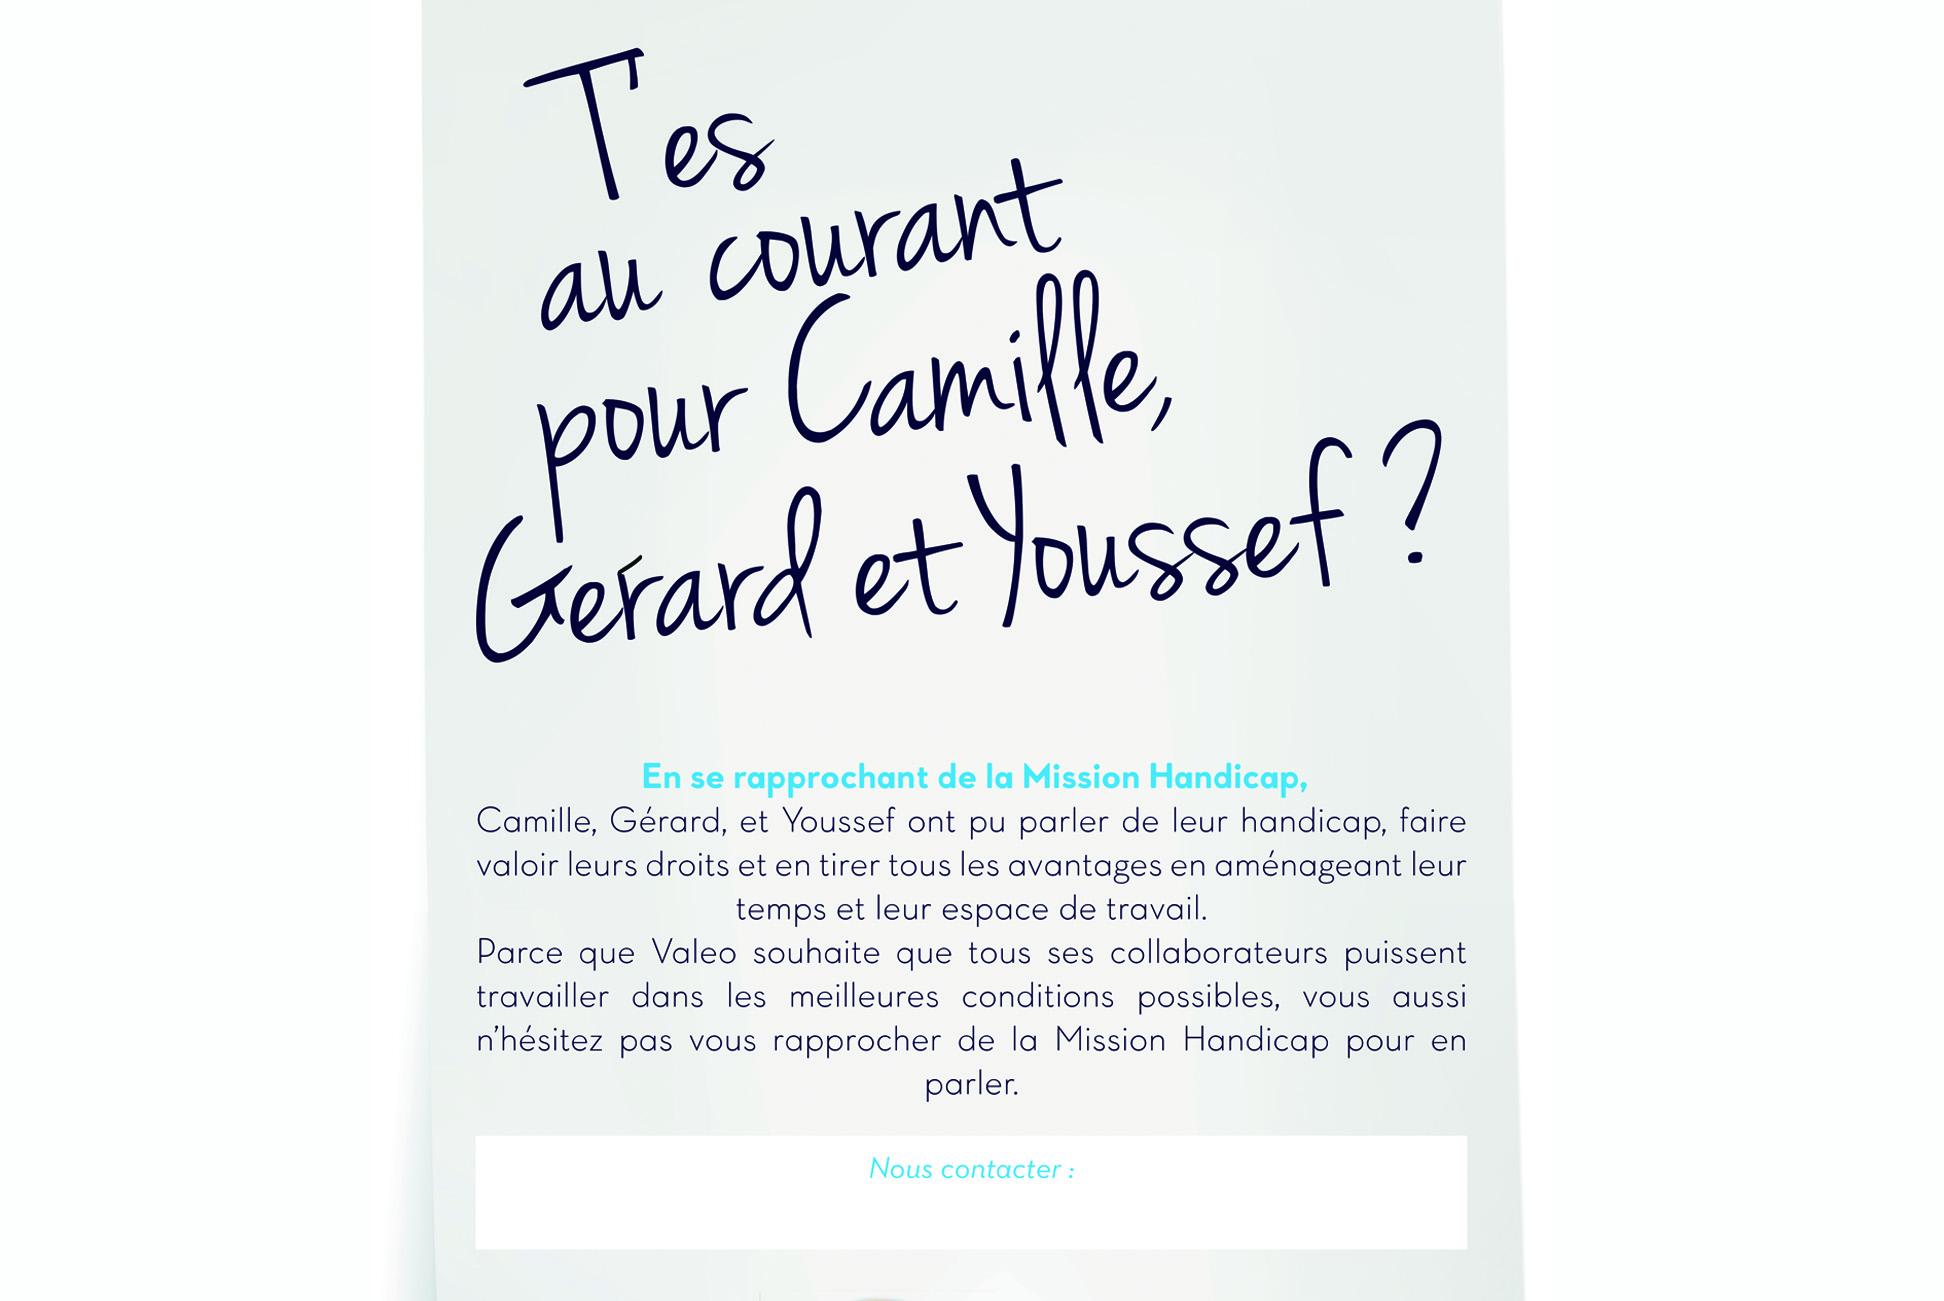 Campagne-des-post-it-interne-copie